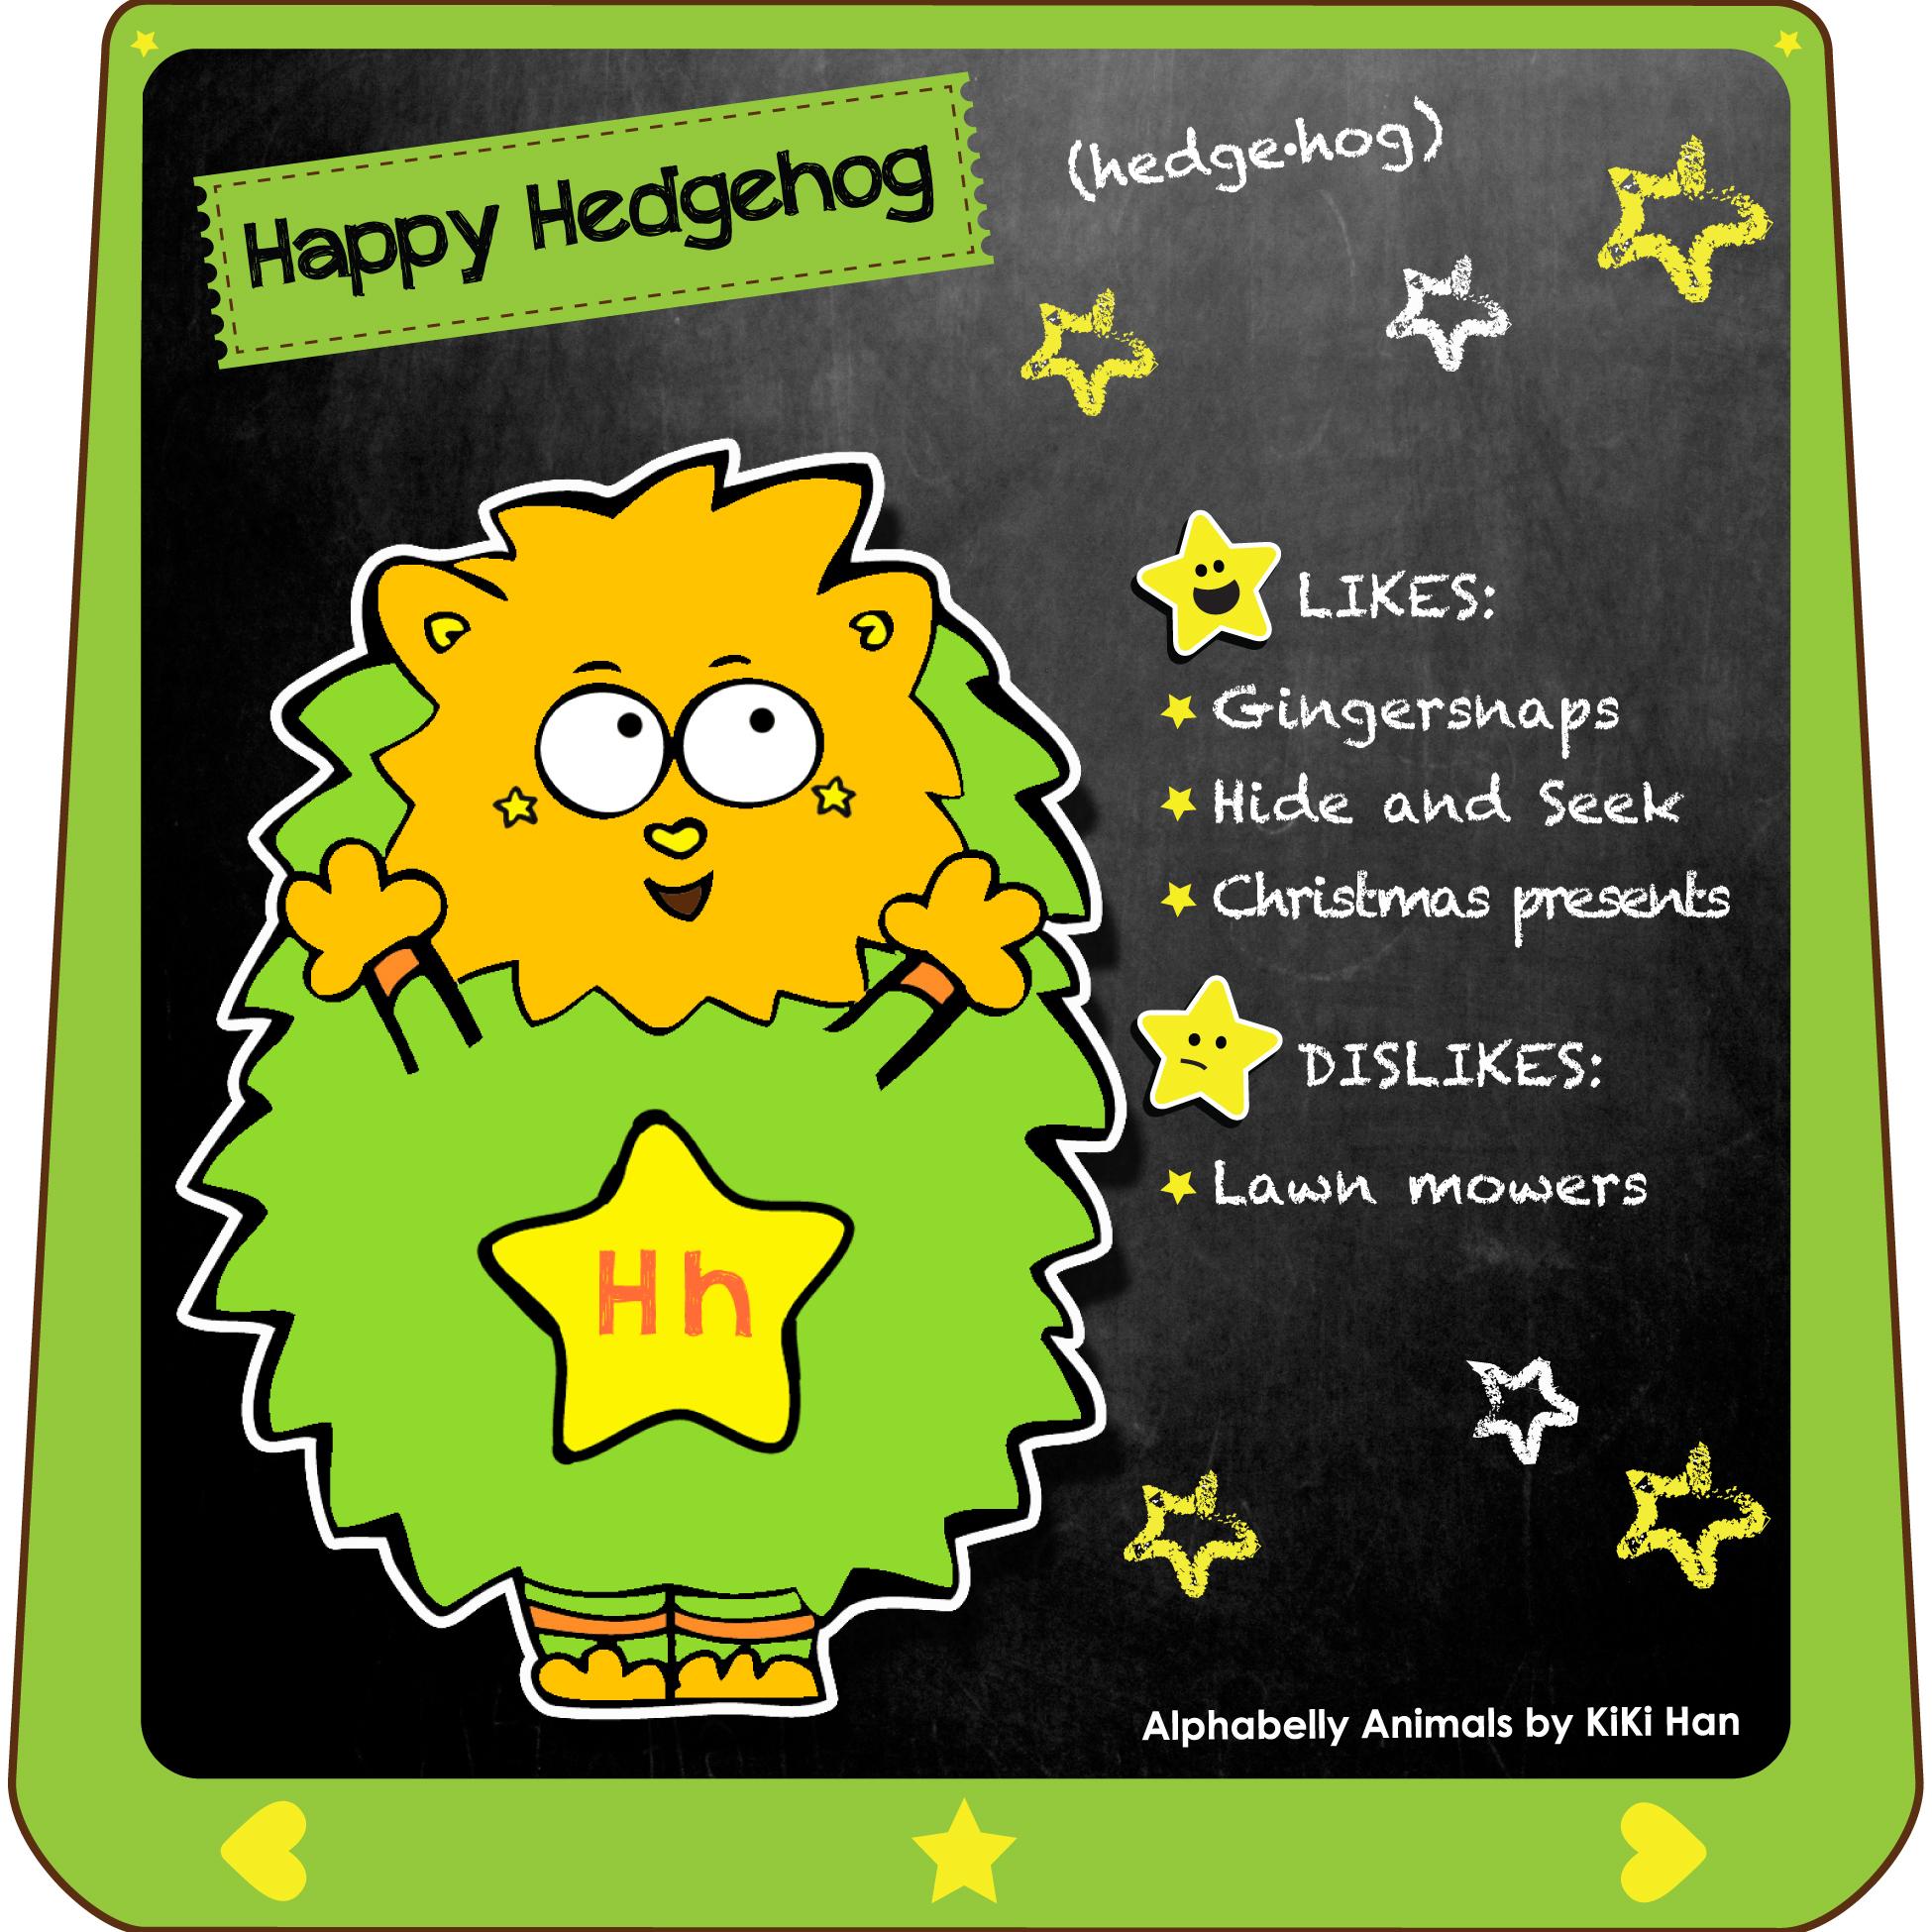 Hedgehog I KiKi Han I KiKiHan I GeekyKiKi I Geeky KiKi I Missgeekykiki I Cutiecons I Cutiecon I Cutie Con I Alphabellies I Alphabelly I A to Z Animal Poster